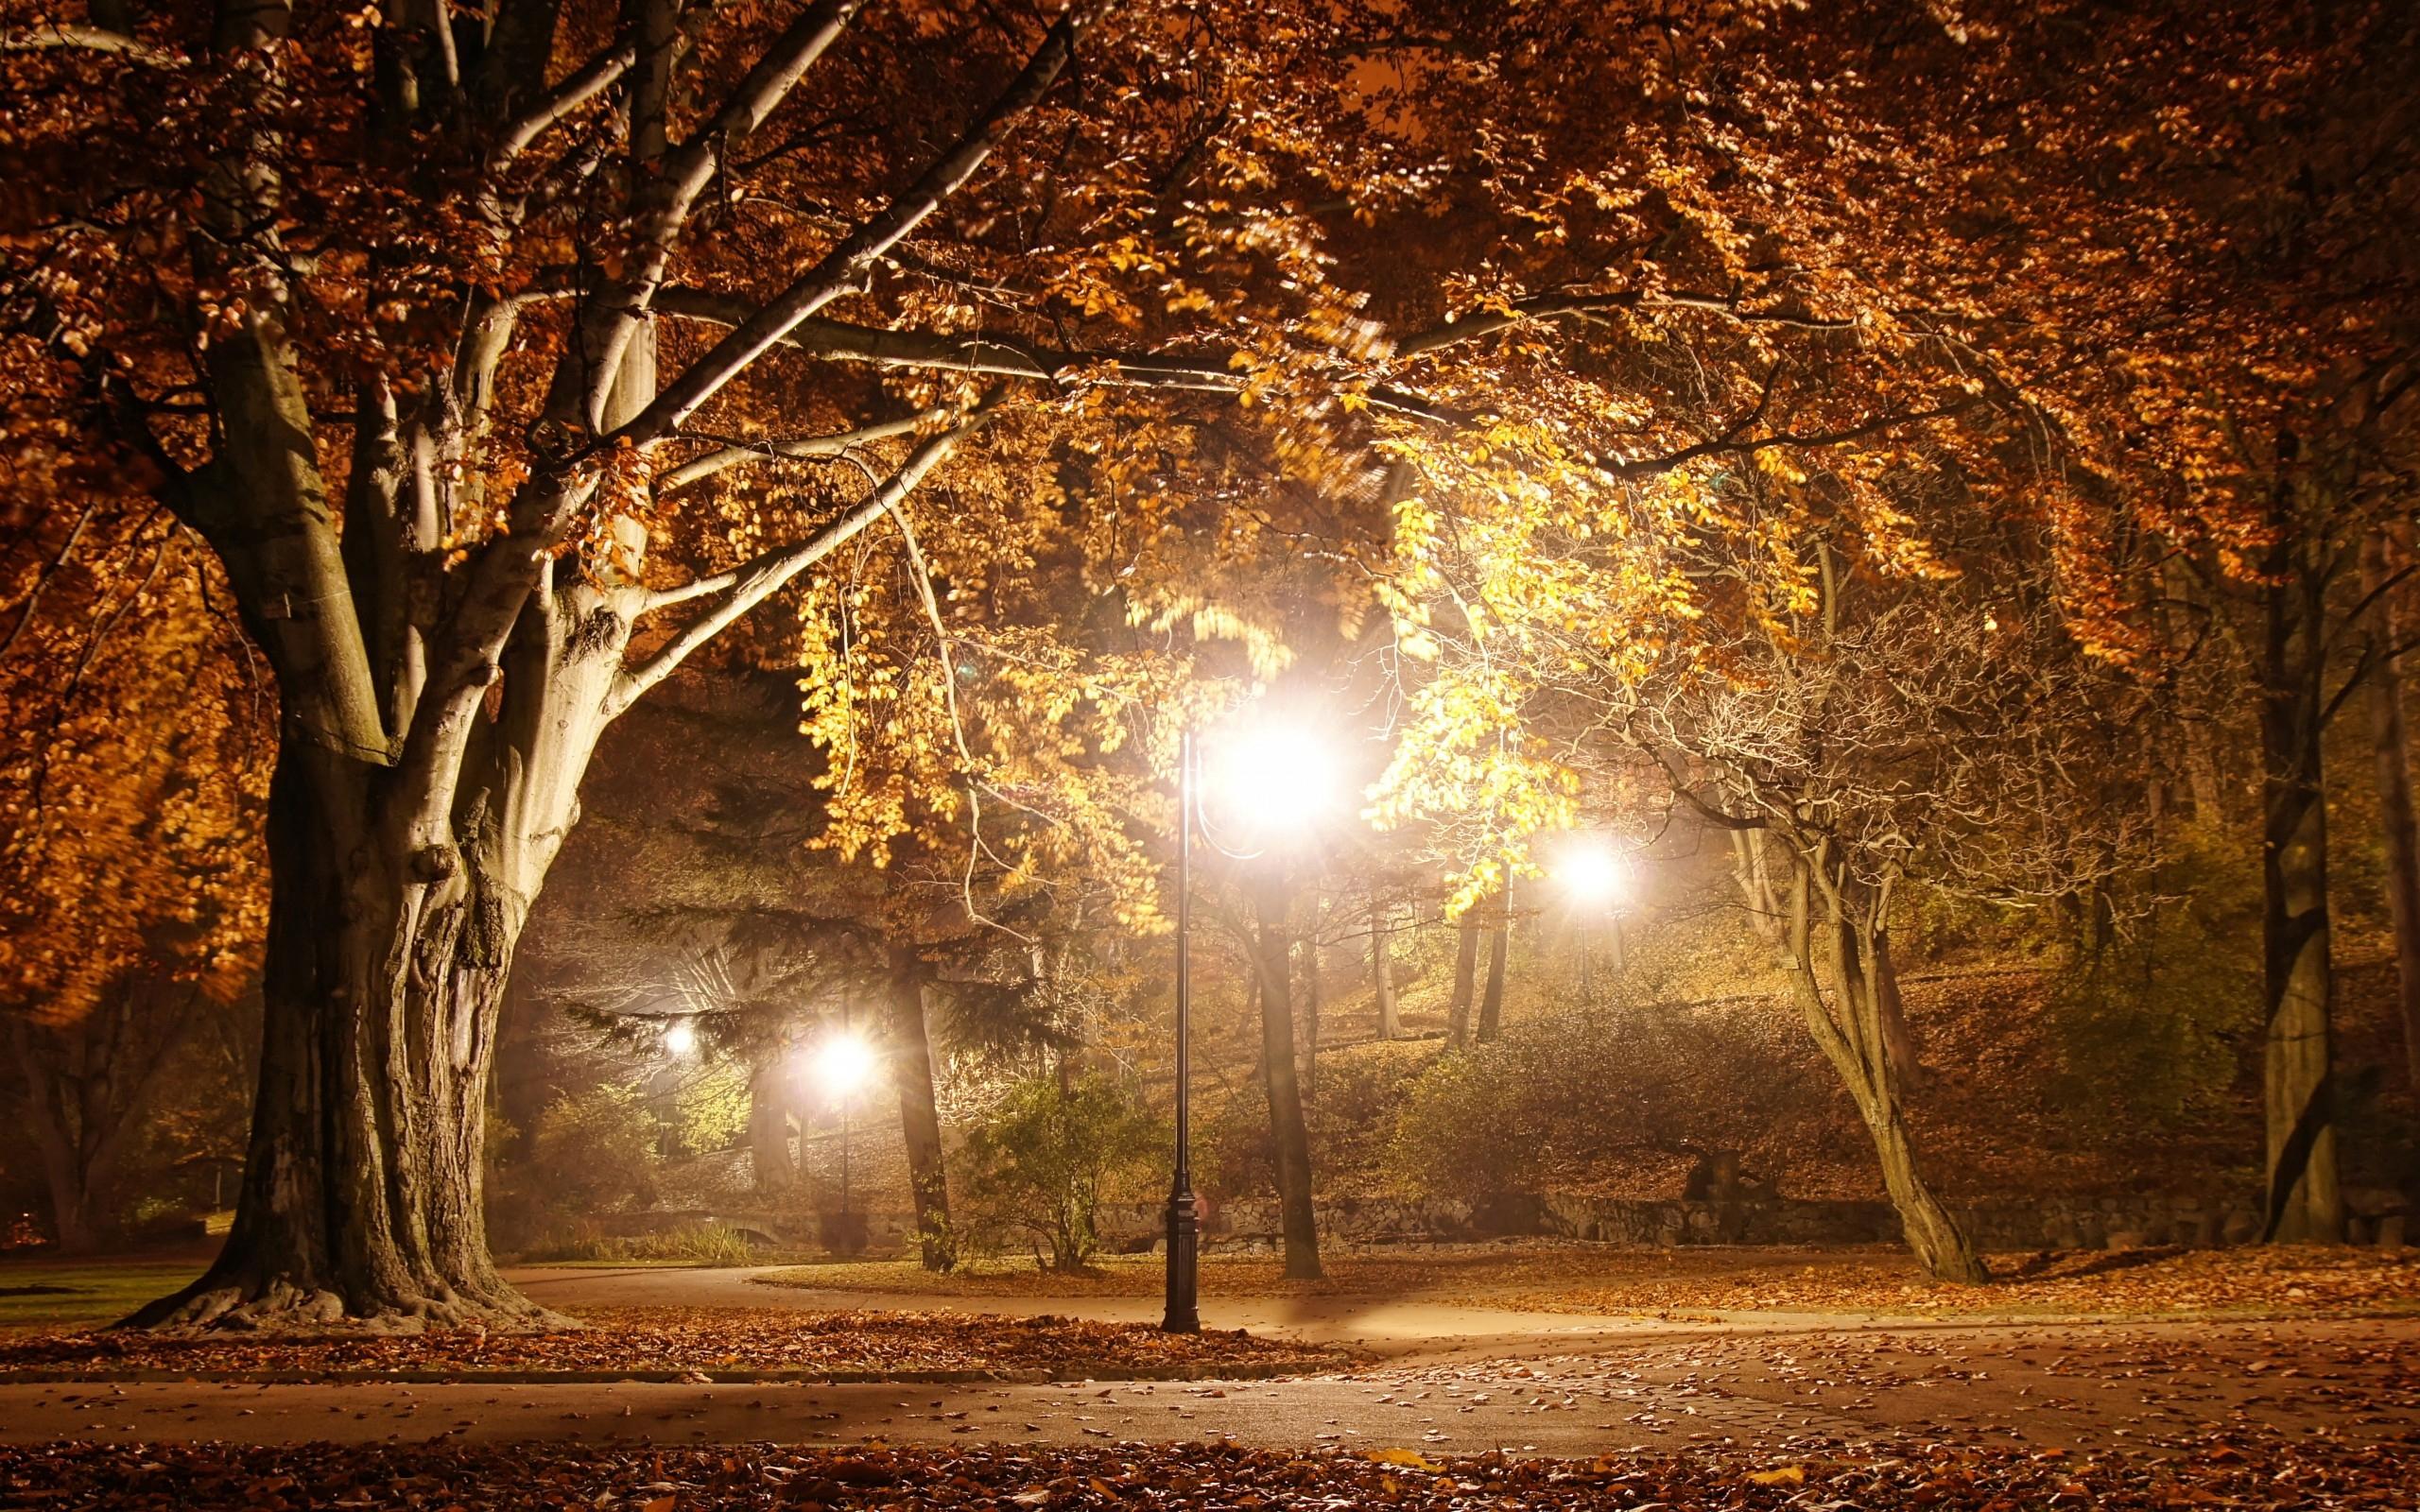 Fall Wallpaper Hd For Galaxy S4 Night Park View Hd Wallpaper